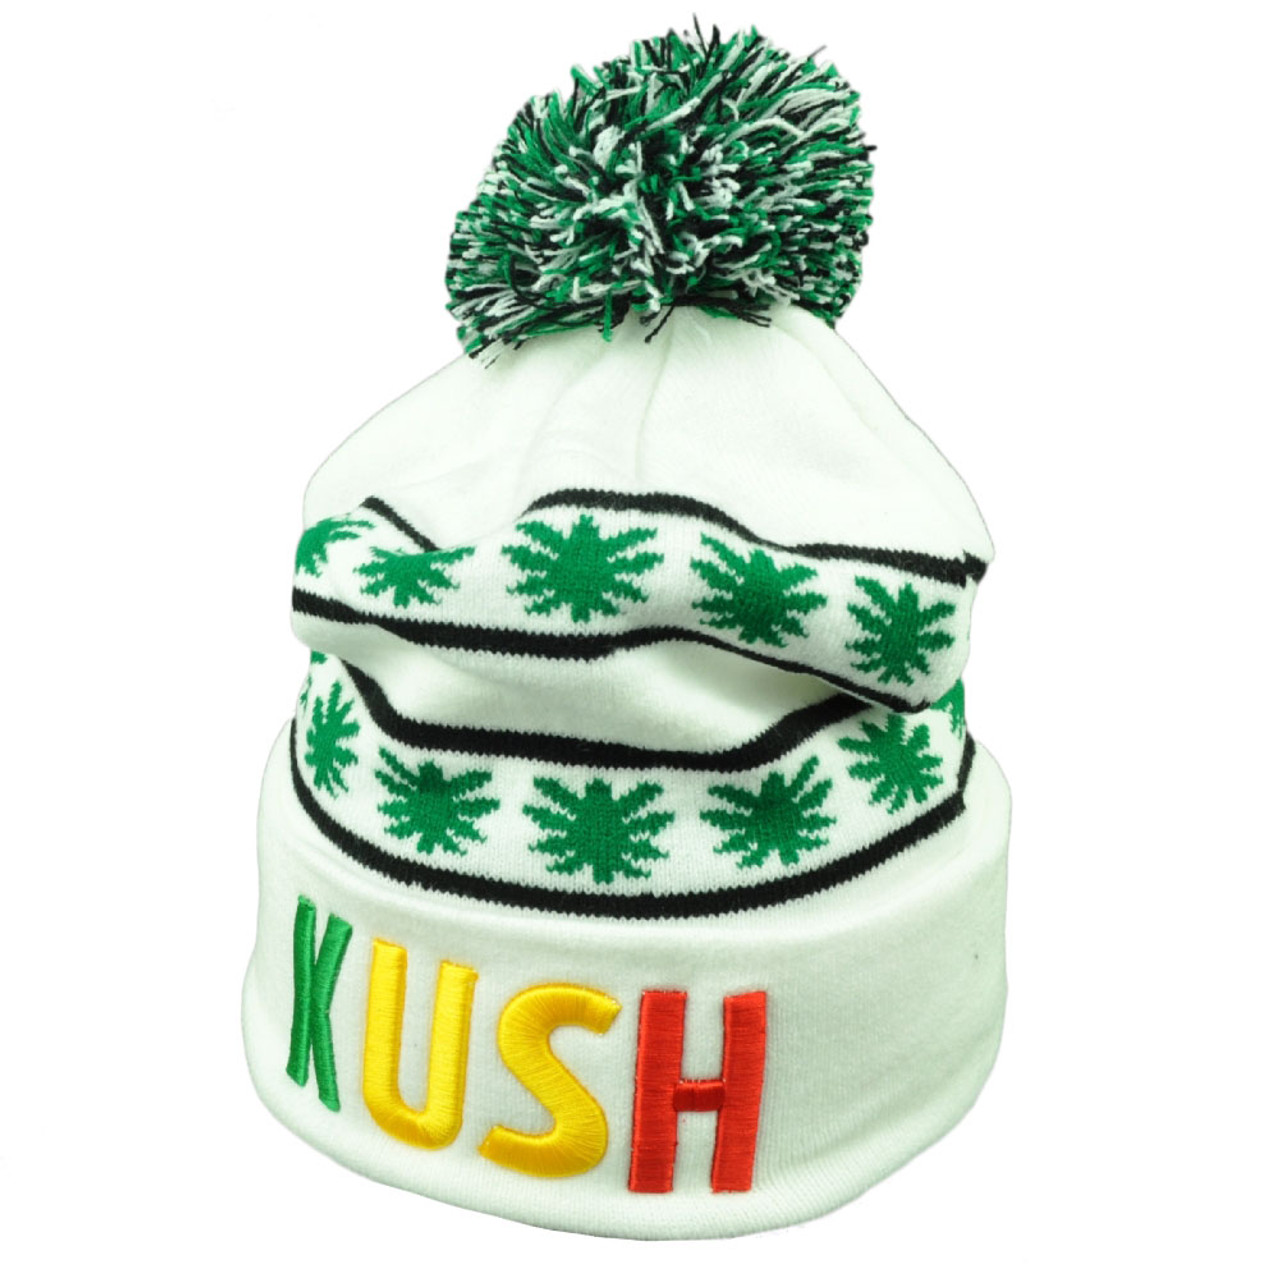 Marijuana White Pom Pom Knit Beanie Cuffed Ganja Rastafari Leaf Weed Kush  Hat - Cap Store Online.com 26b0260929bb